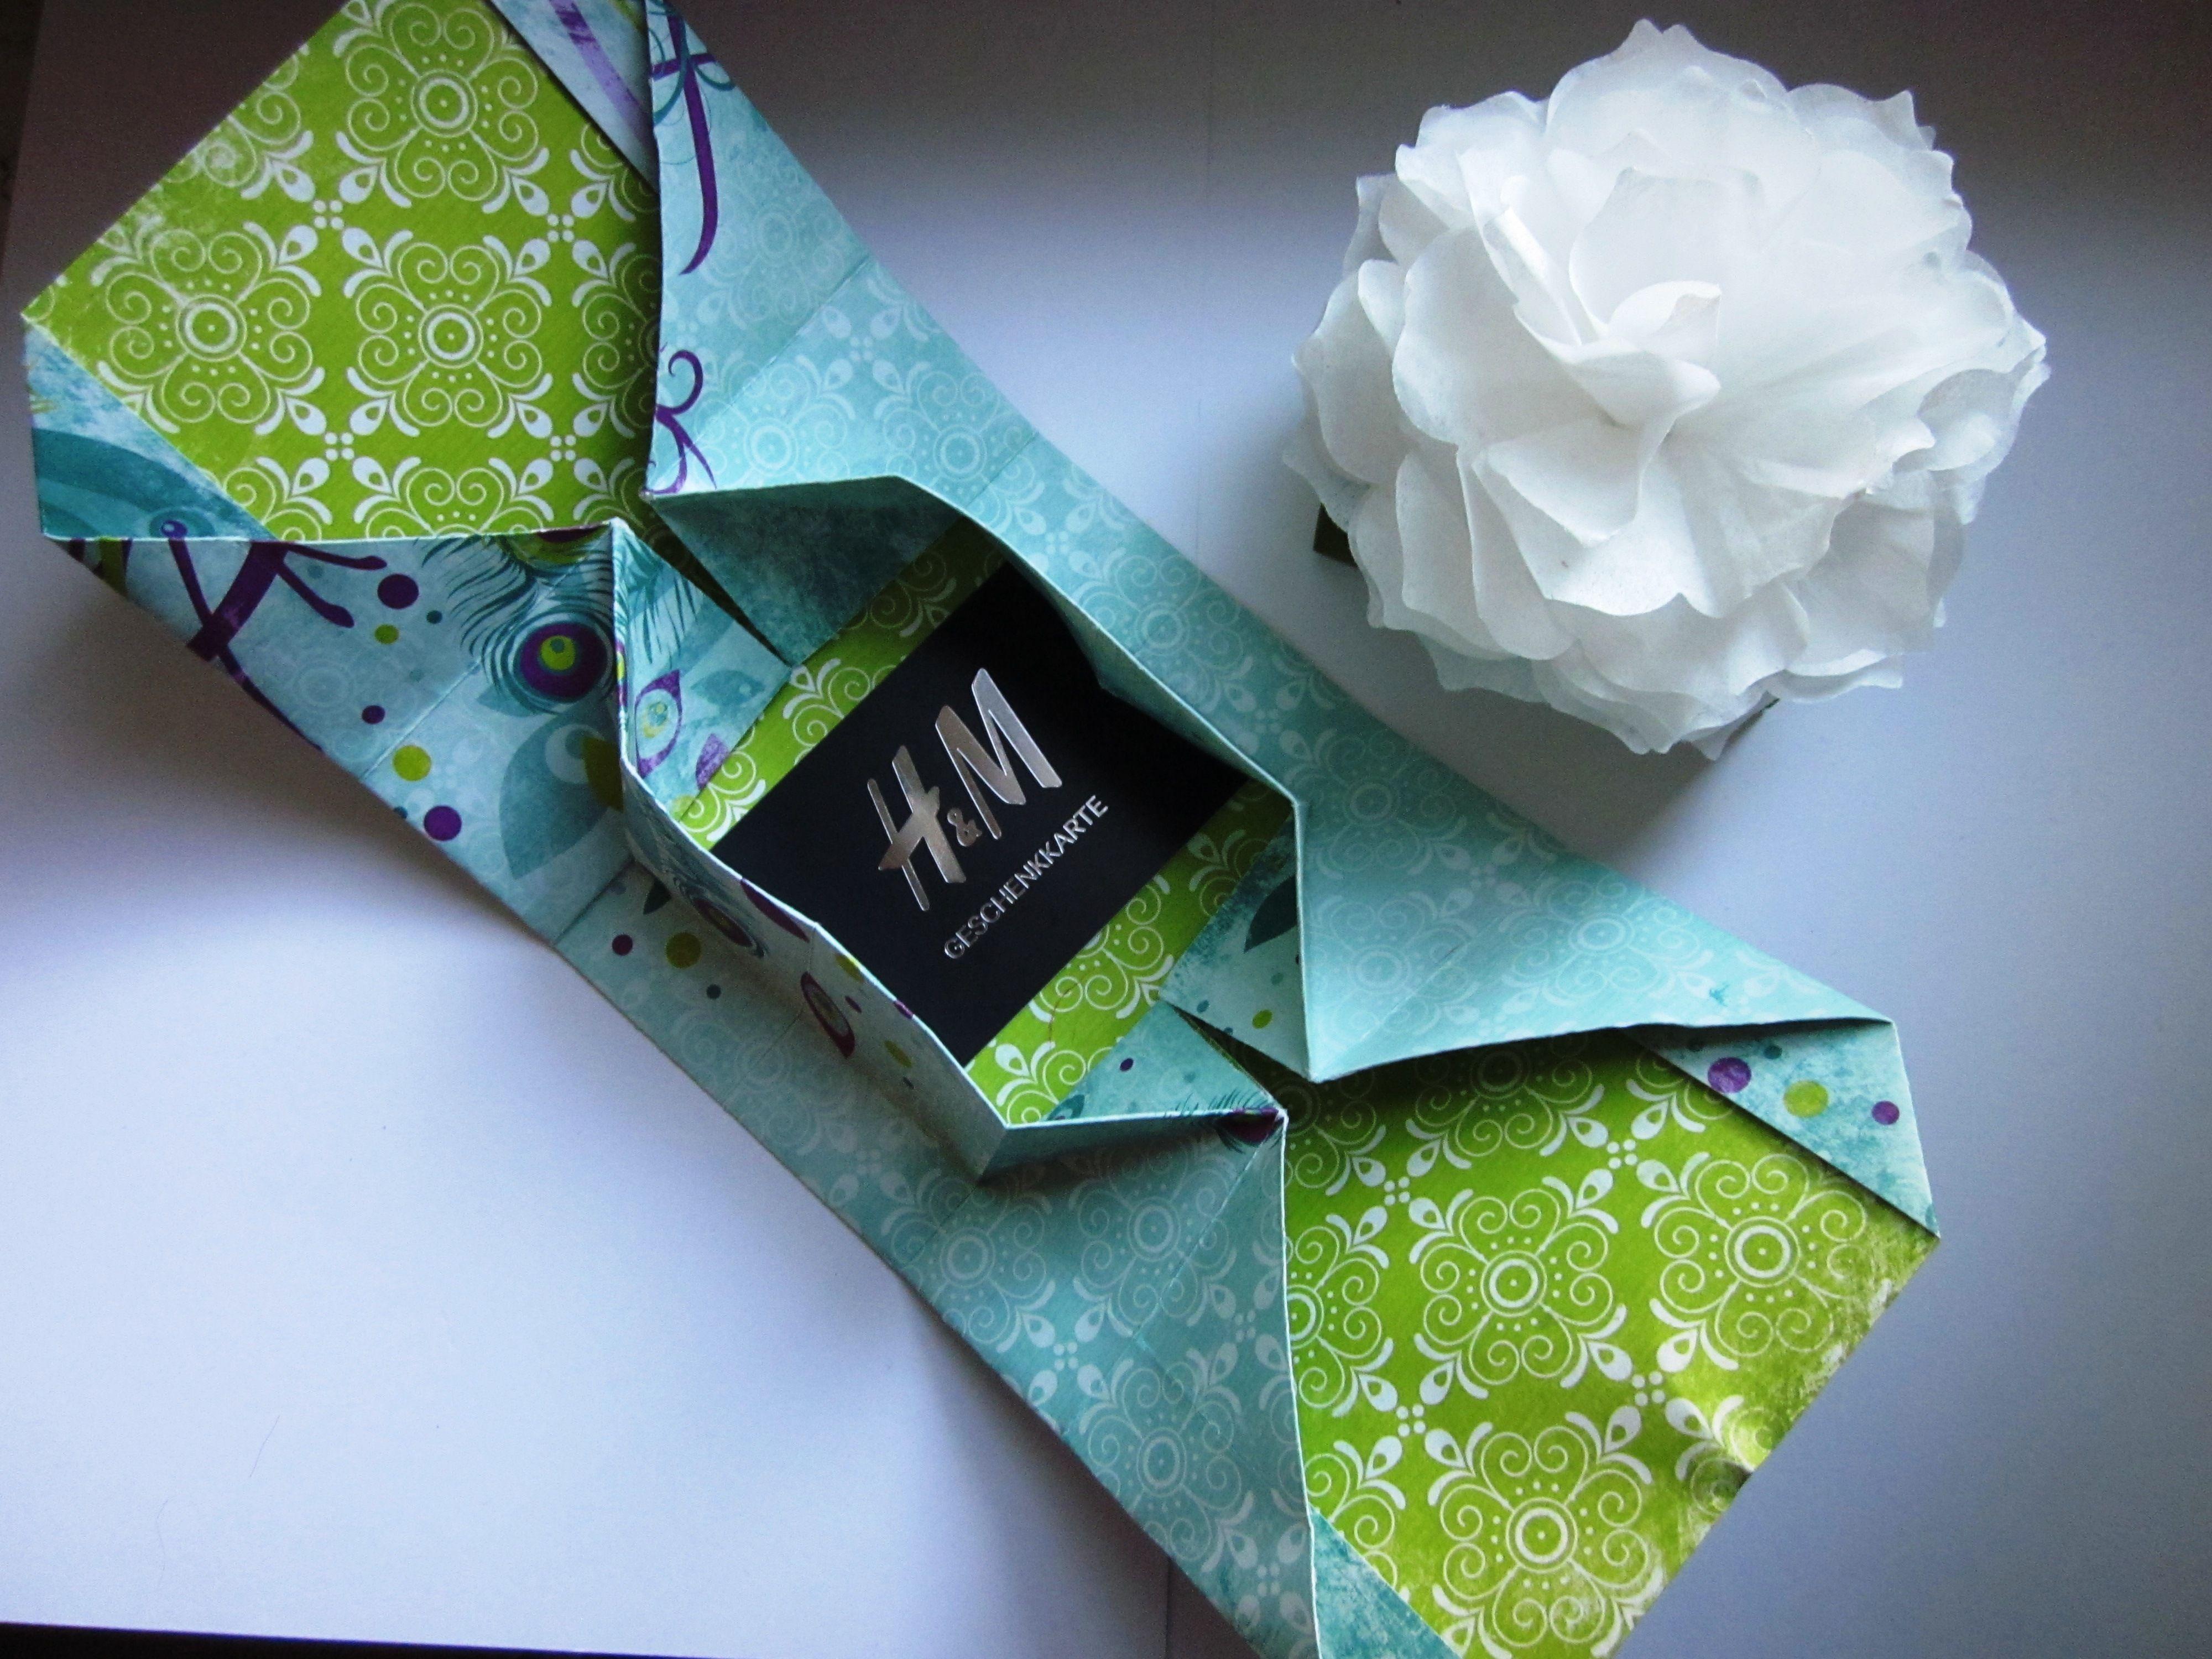 stampin up origamibox gutscheinkarte verpackung stampin up pinterest. Black Bedroom Furniture Sets. Home Design Ideas